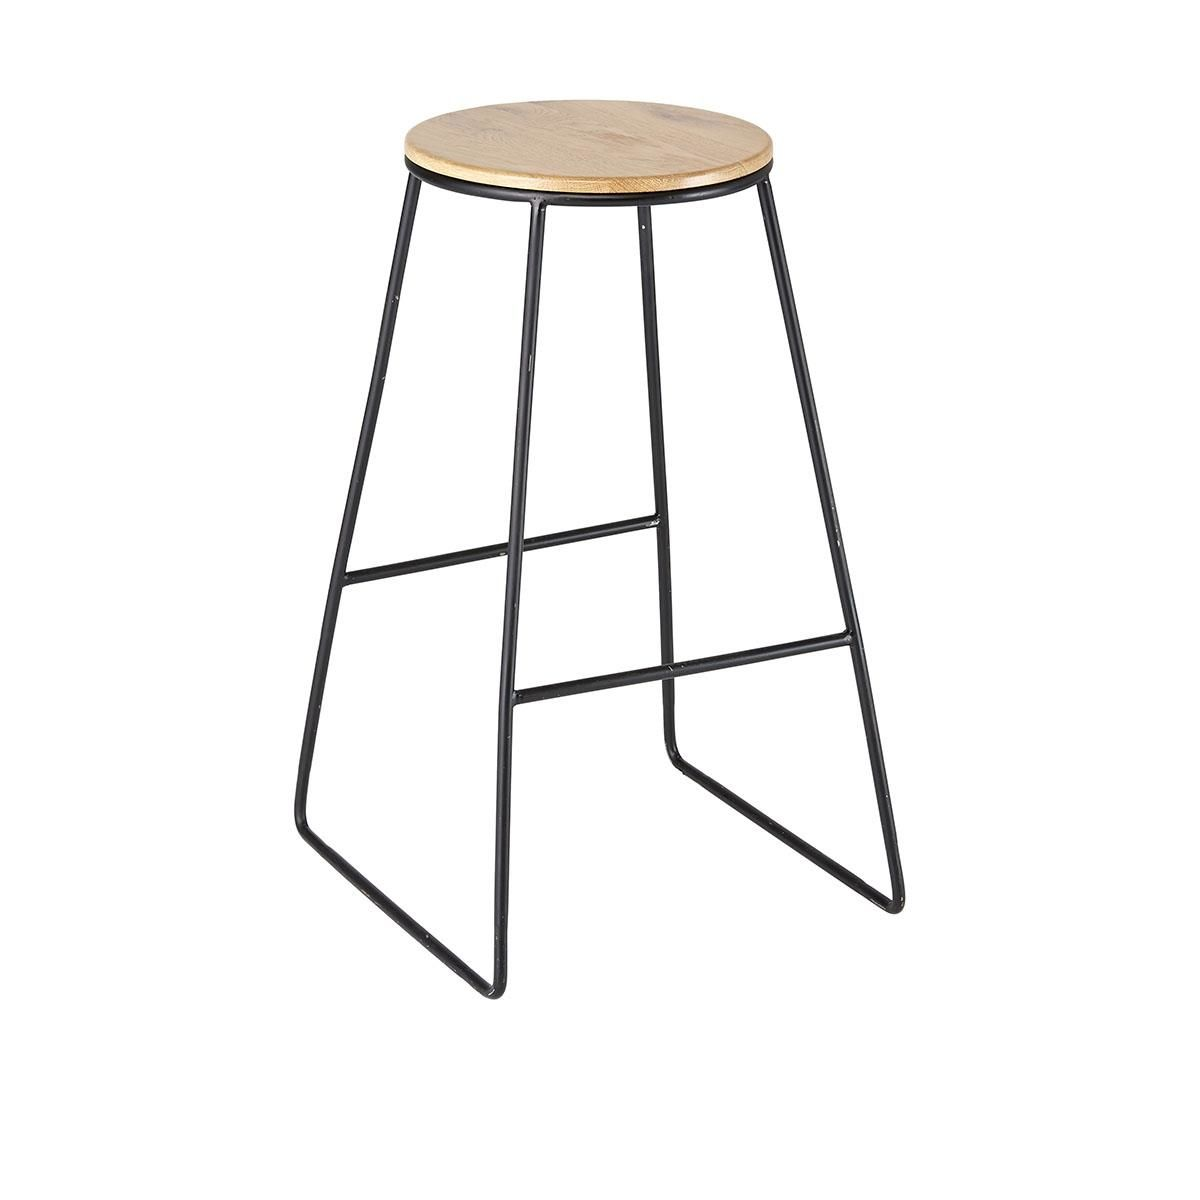 Top Image Bar Chair Kmart